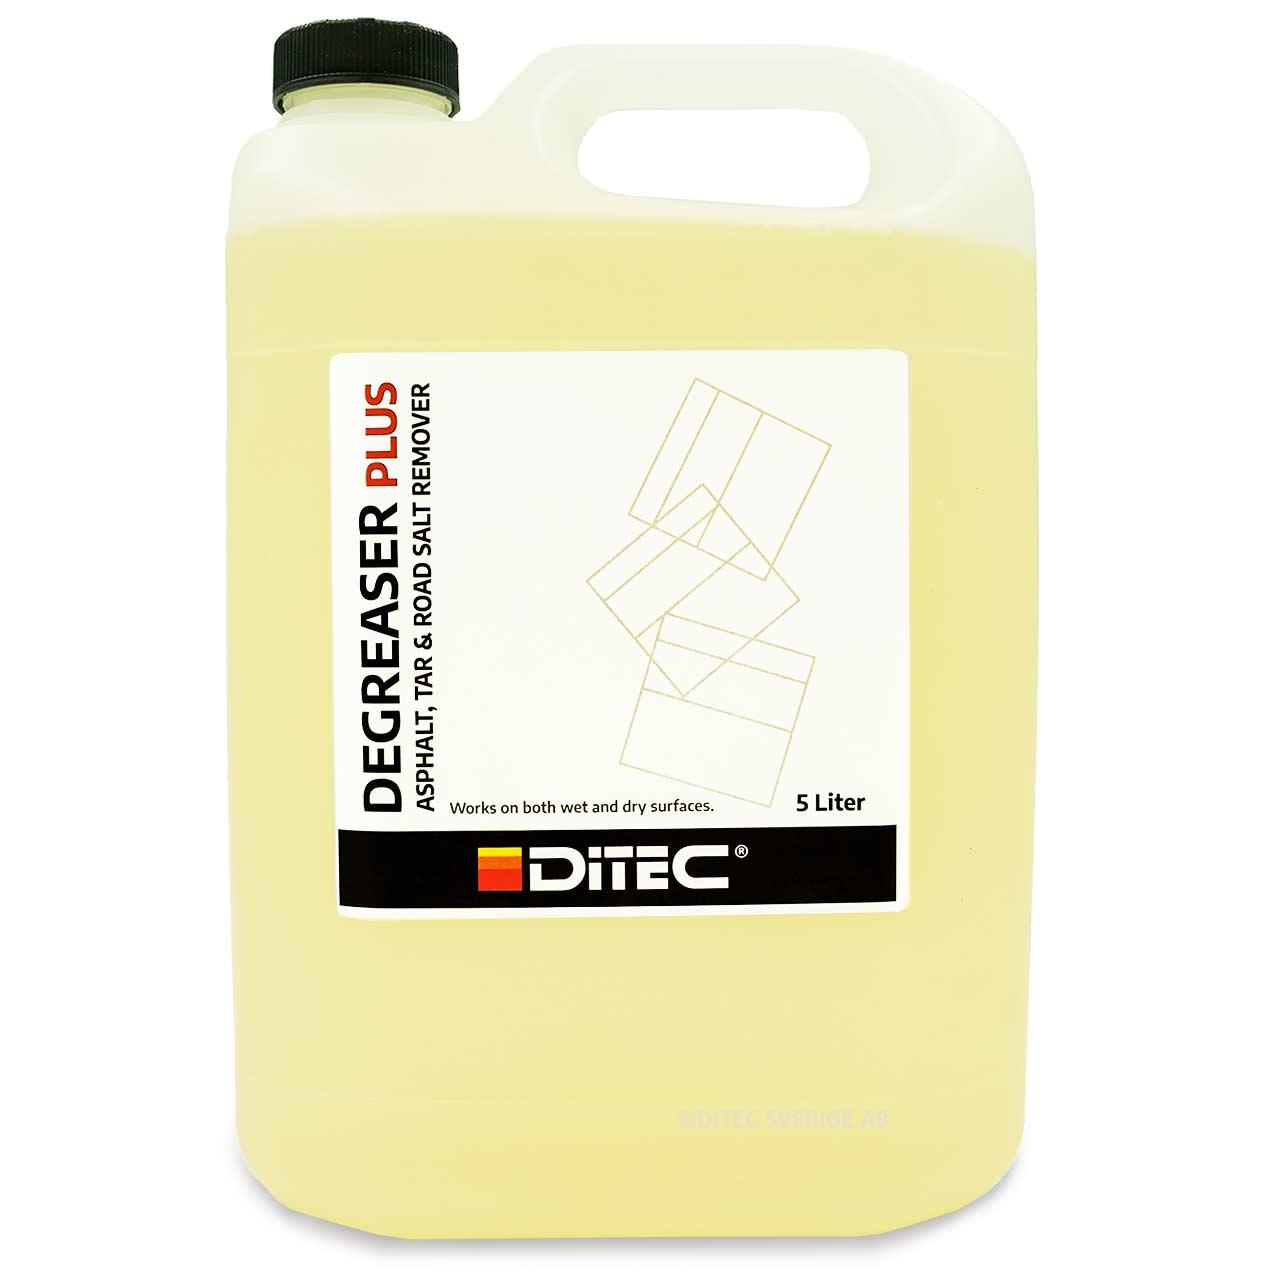 Ditec Degreaser Plus 5 Liter